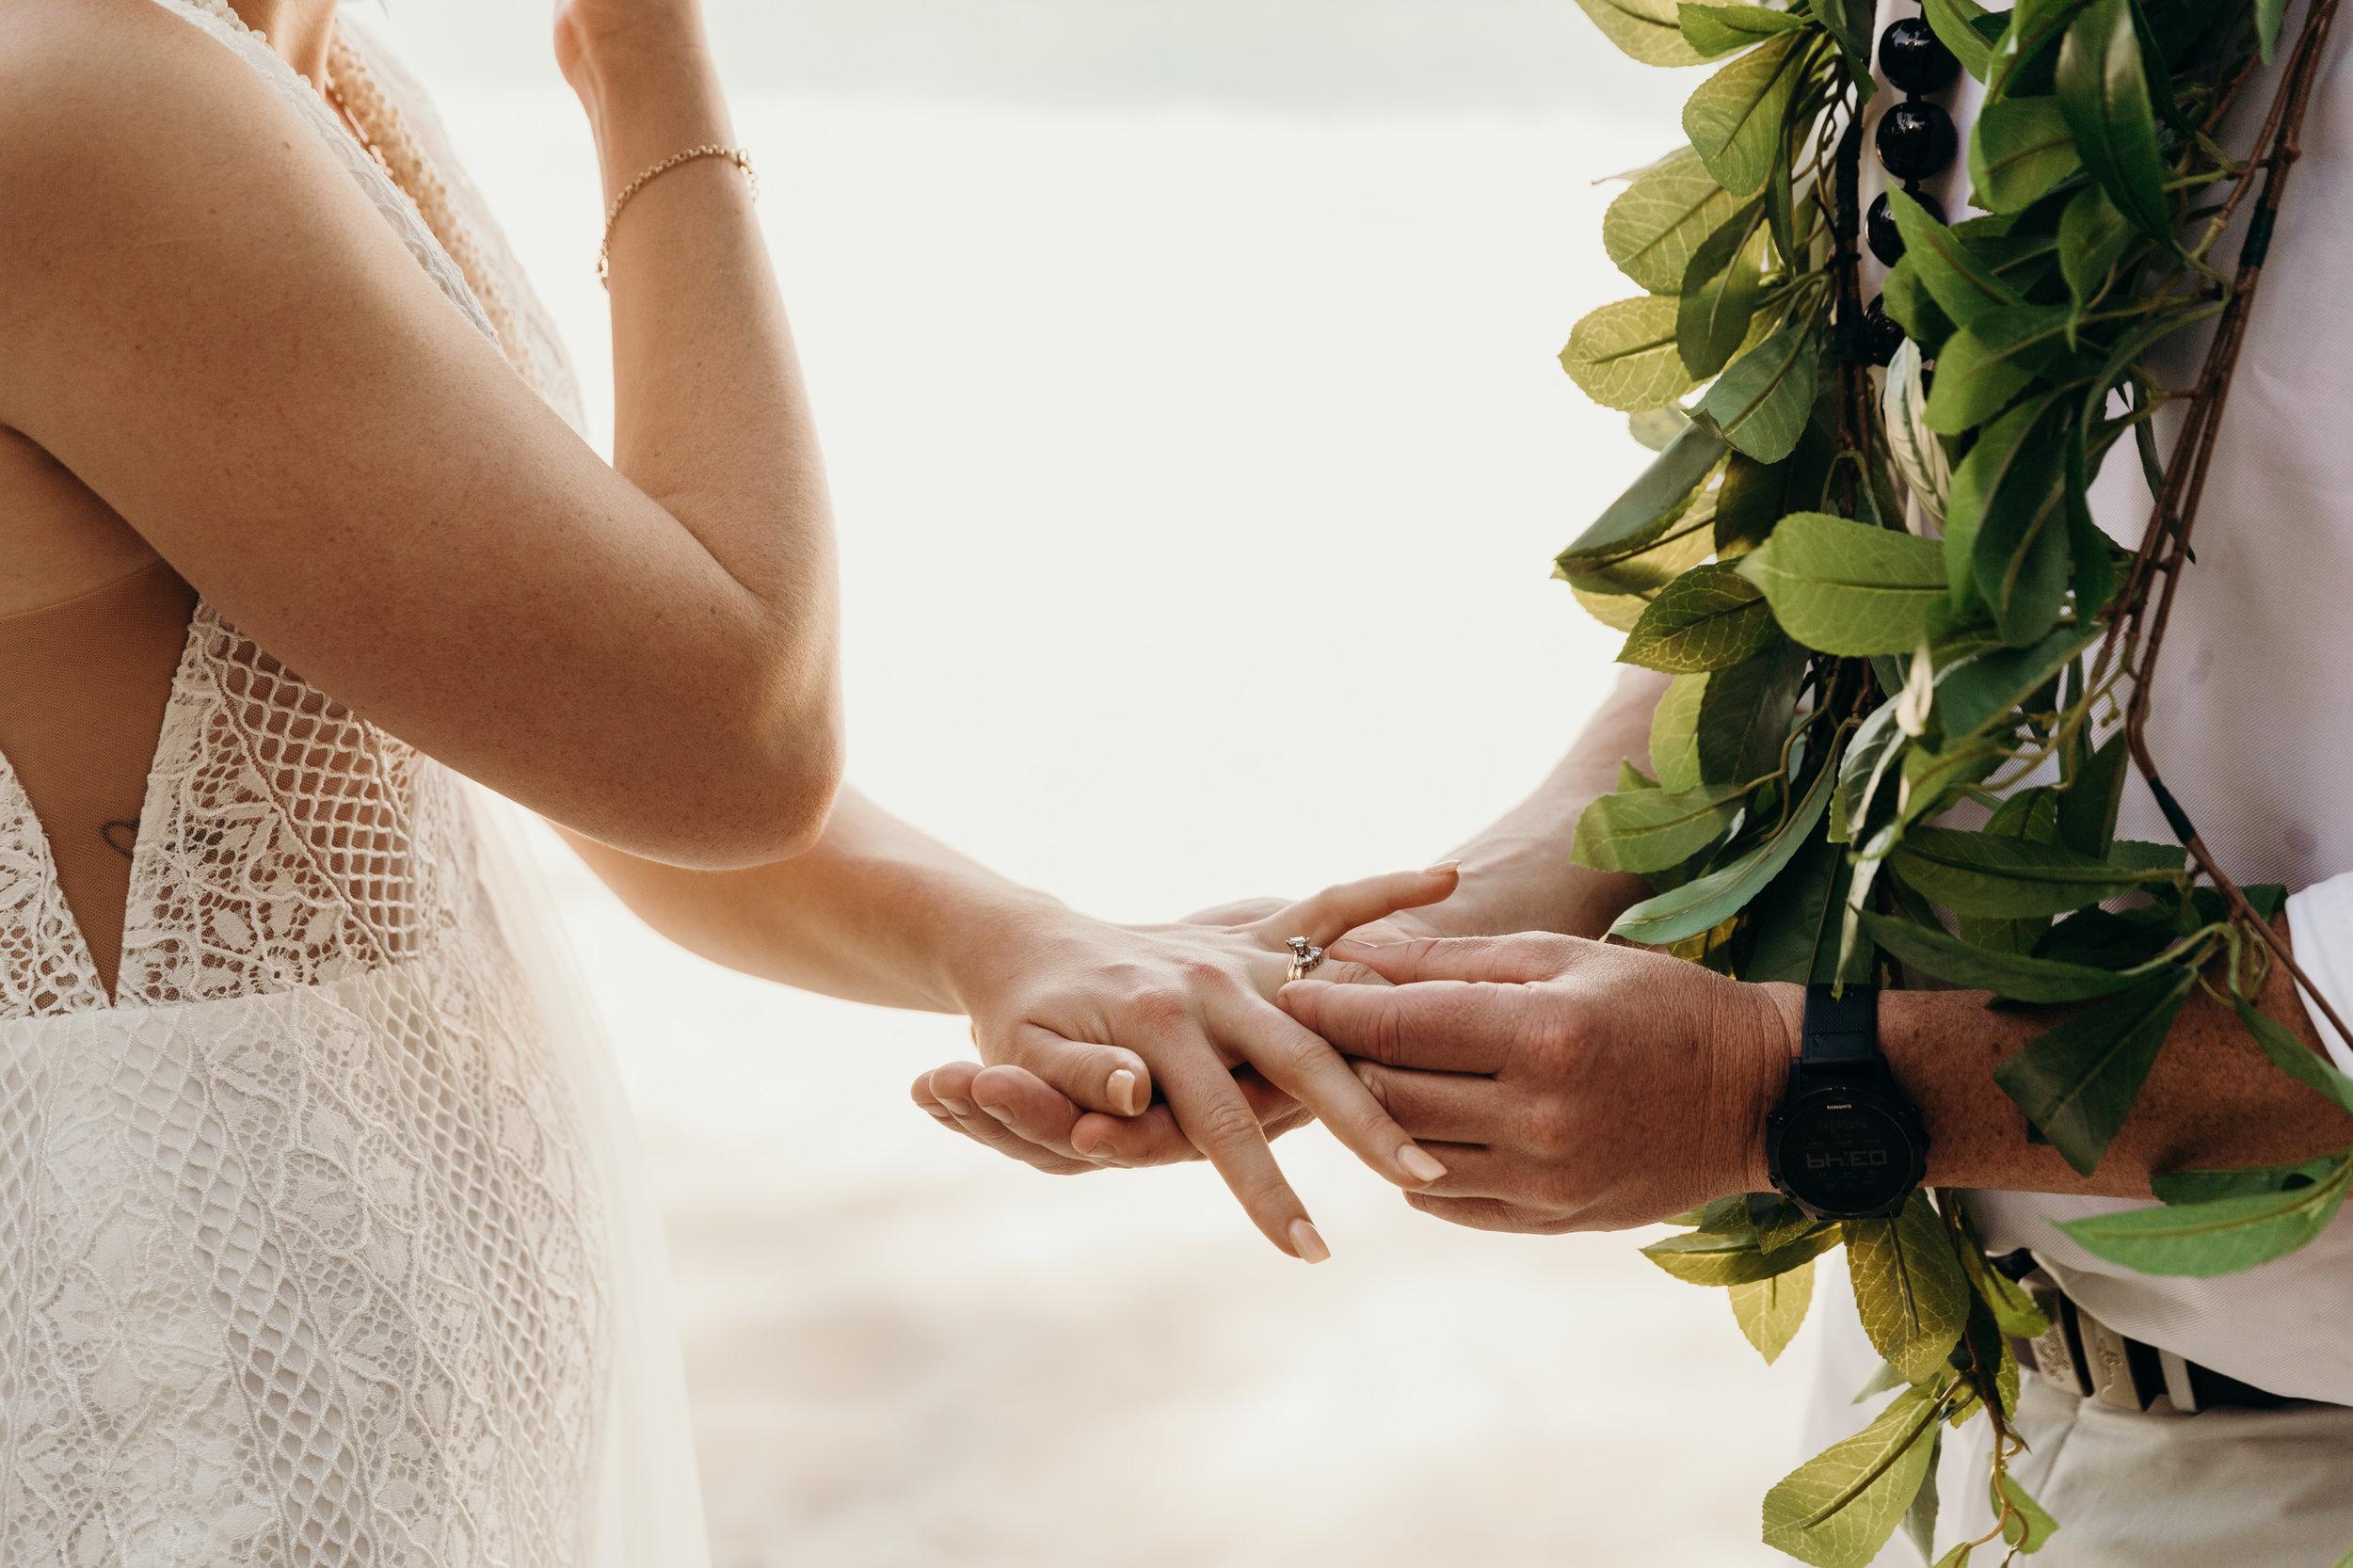 HAWAII-WEDDING-PHOTOGRAPHER-ALOHILANI-RESORT-KEANI-BAKULA-35.jpg